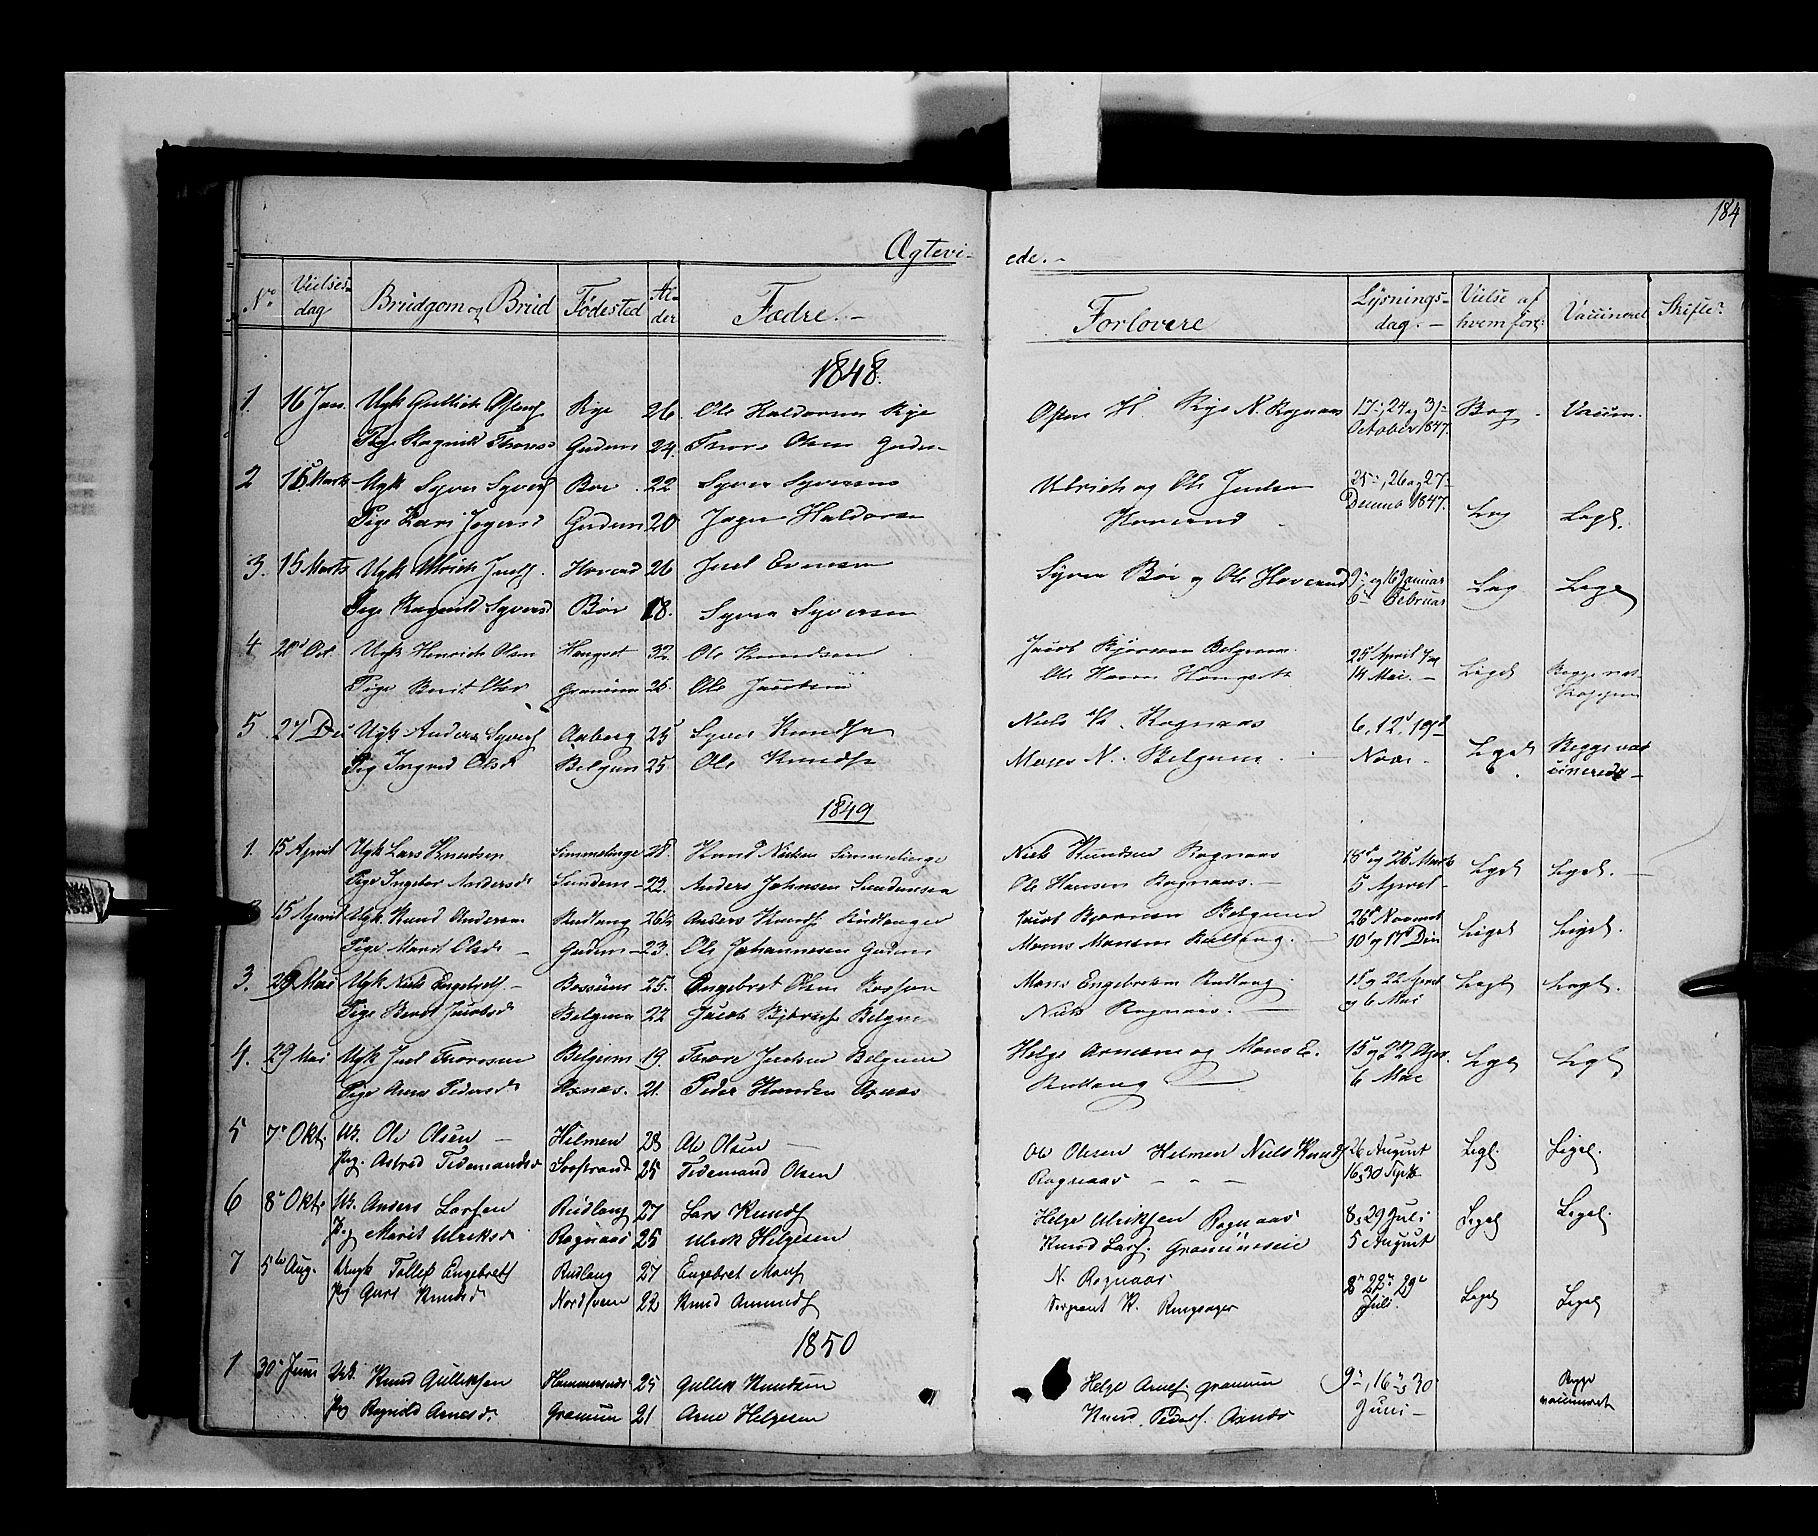 SAH, Nord-Aurdal prestekontor, Ministerialbok nr. 6, 1842-1863, s. 184